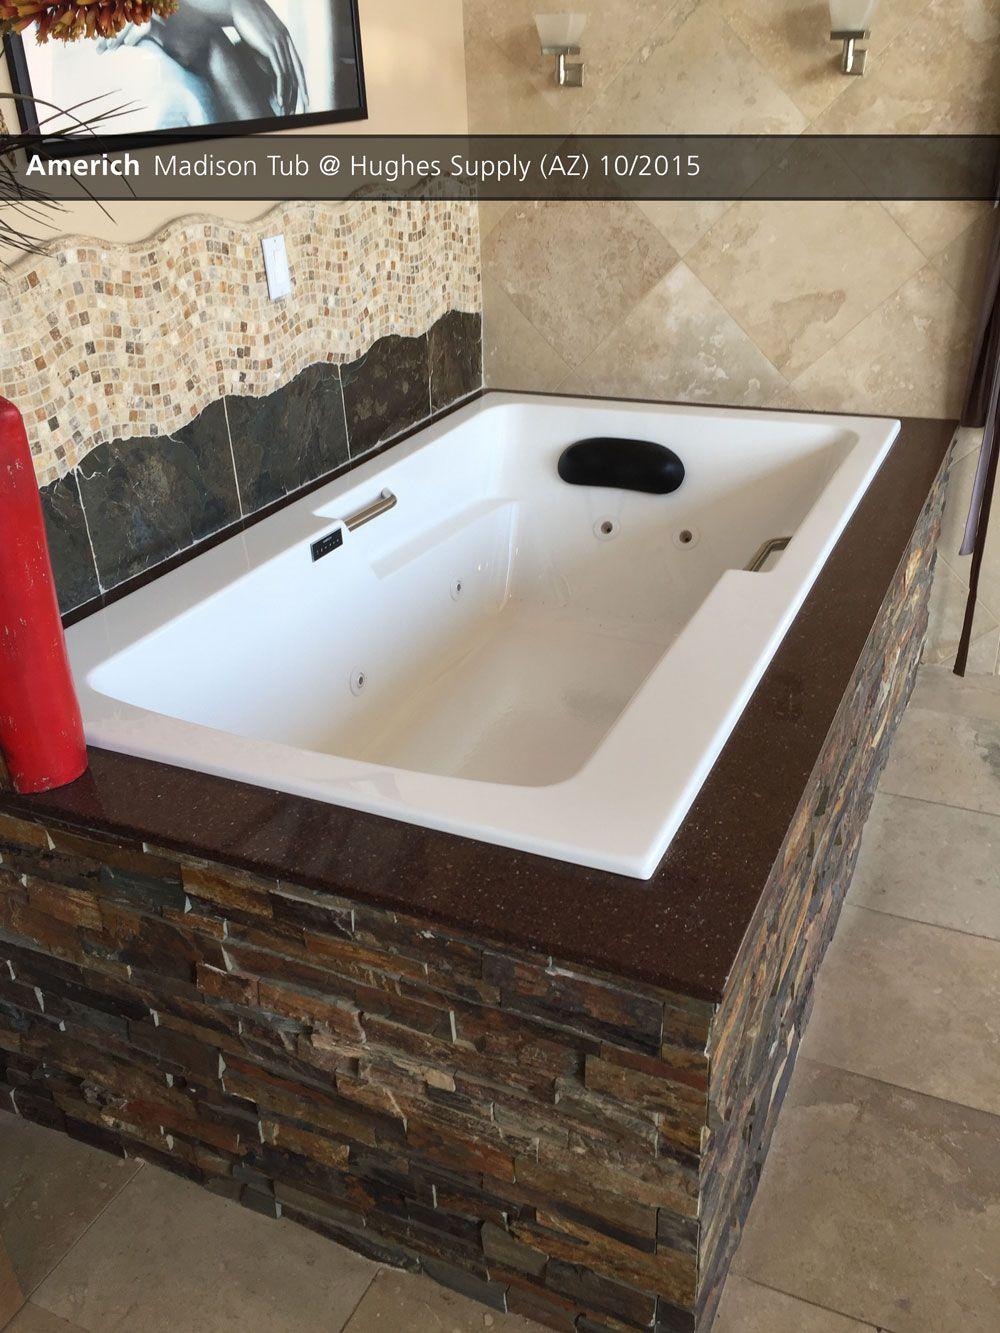 Scottsdale Plumbing Supplies Wholesaler Tub Showroom Display